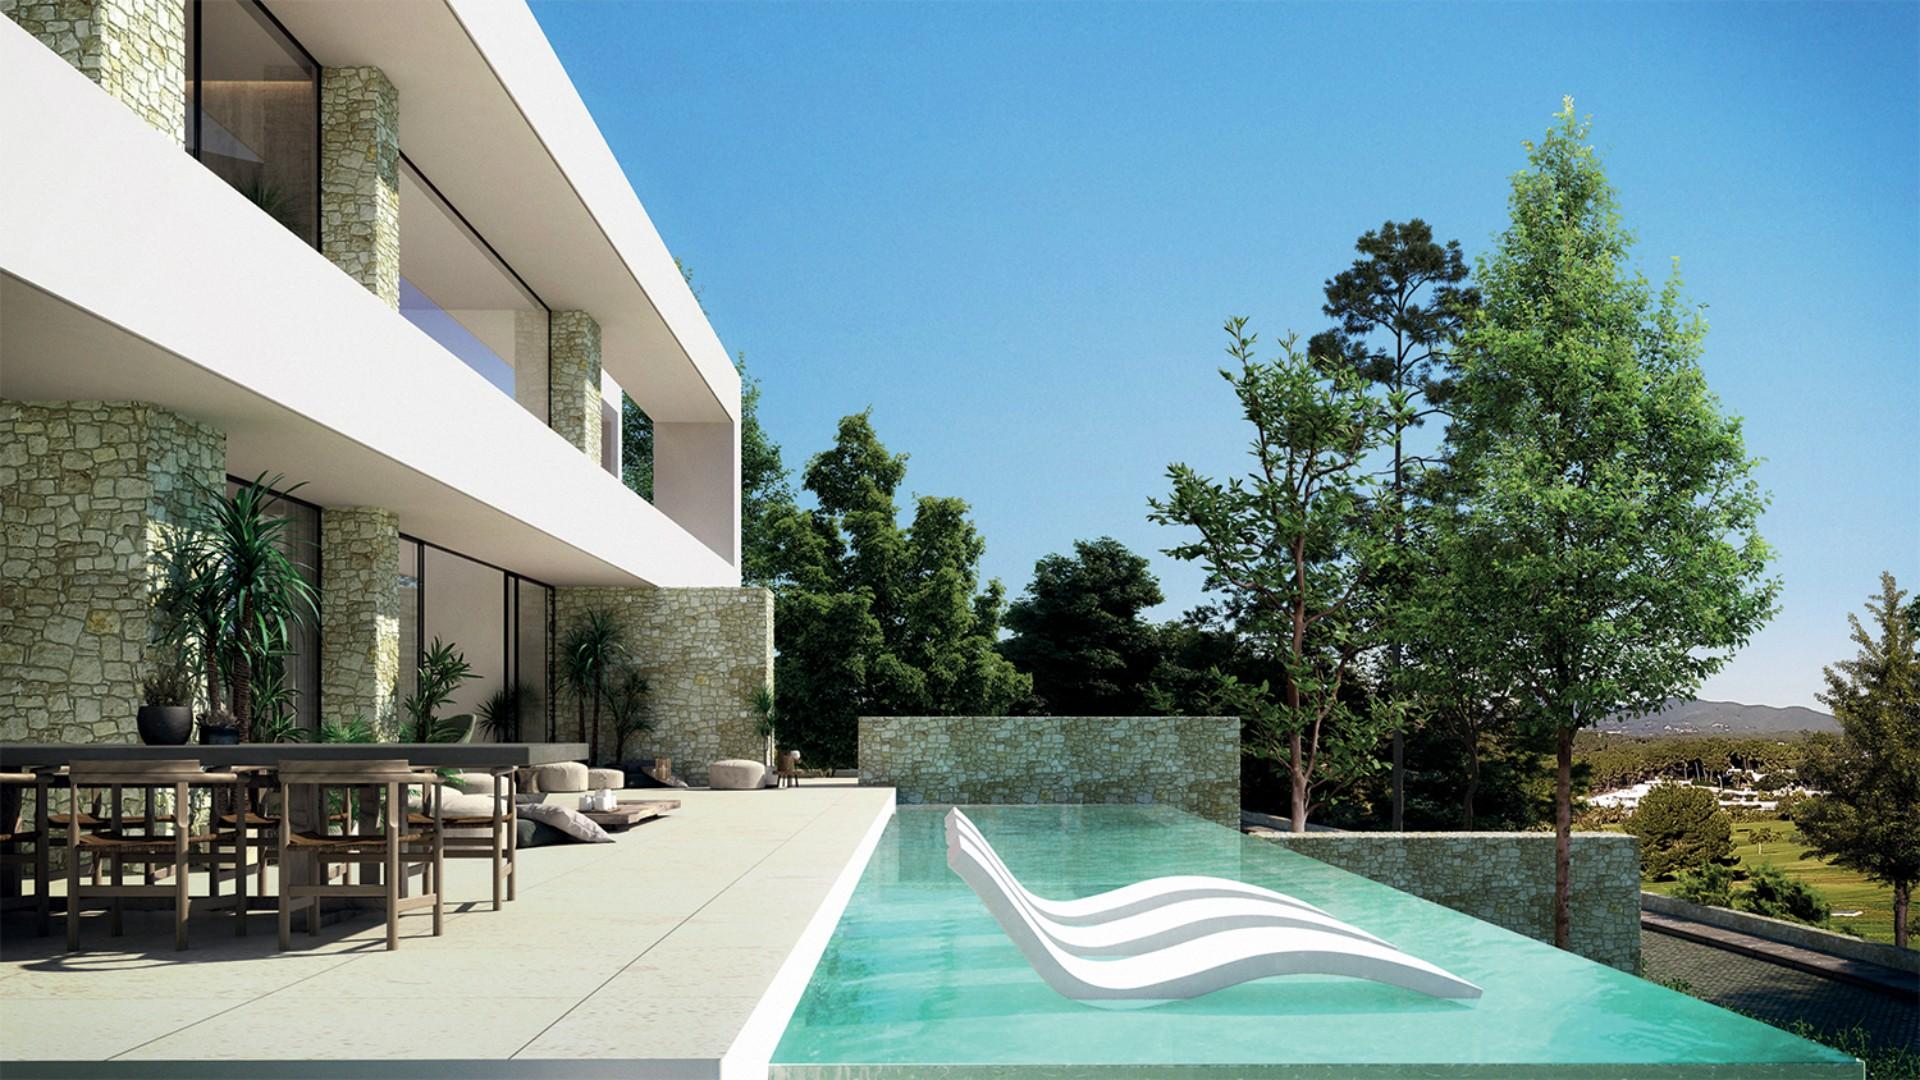 Pool - Type A - Corallisa - Signature Home Ibiza